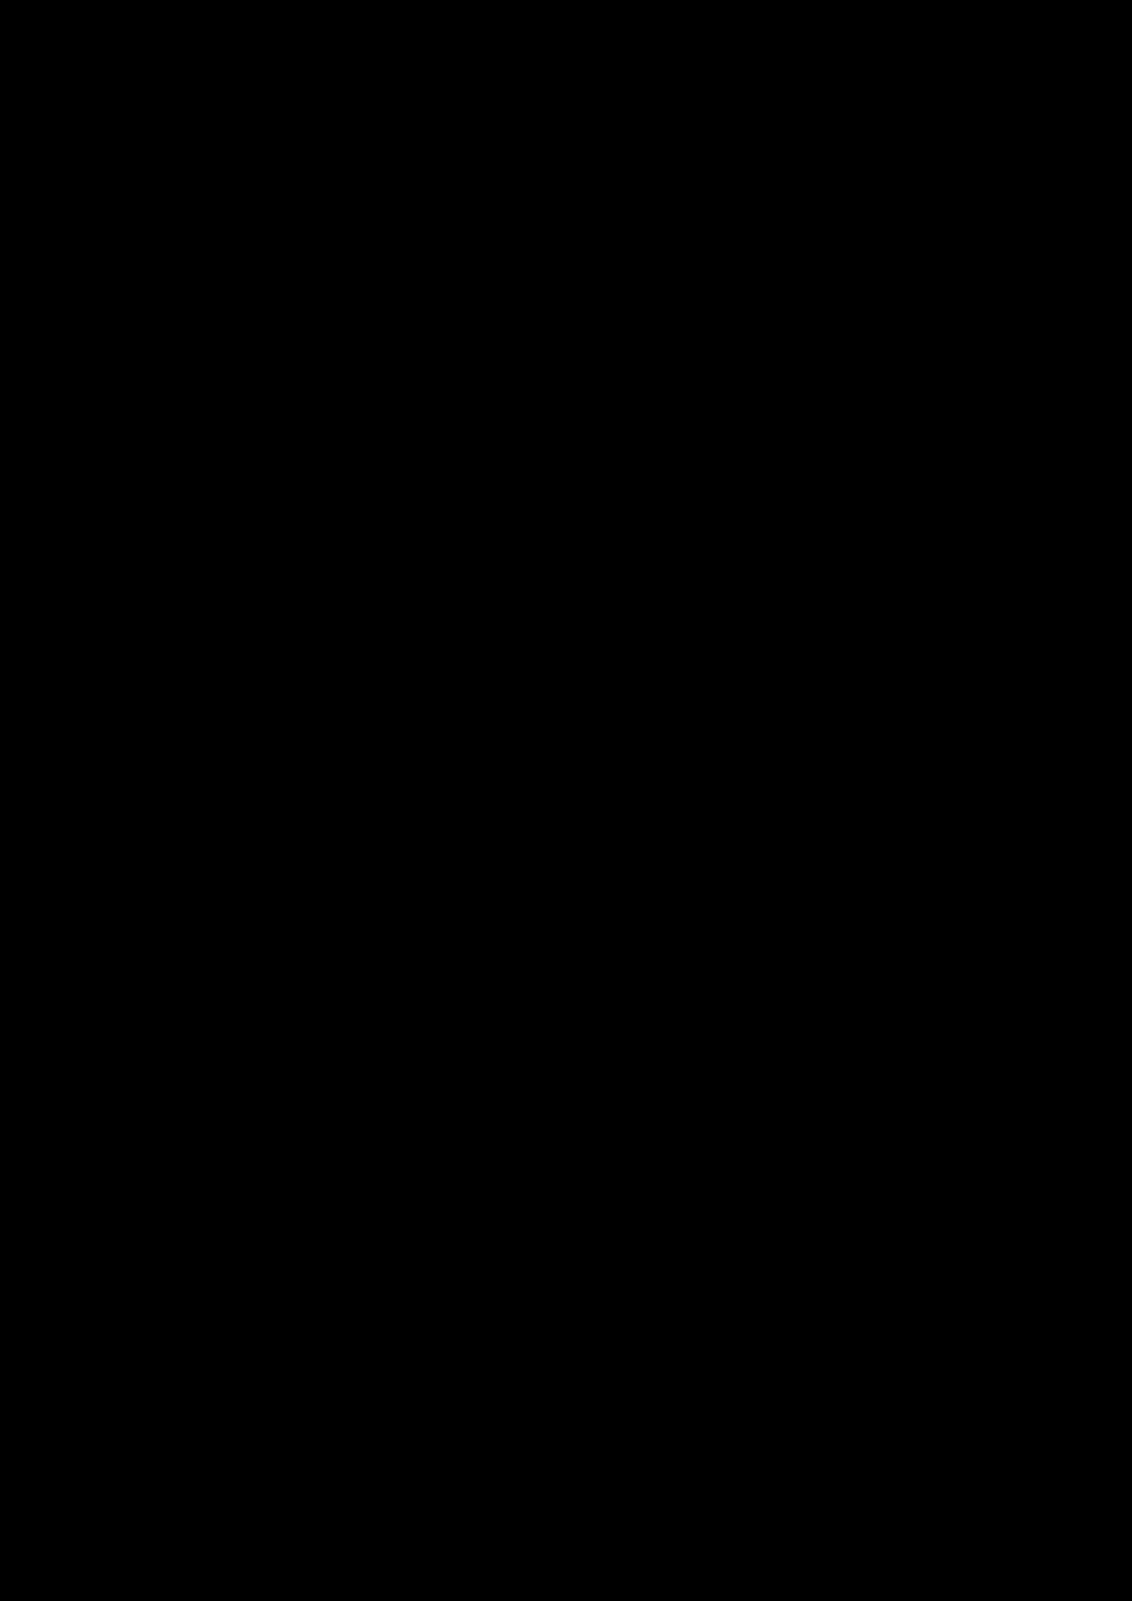 Hochu CHayu slide, Image 1